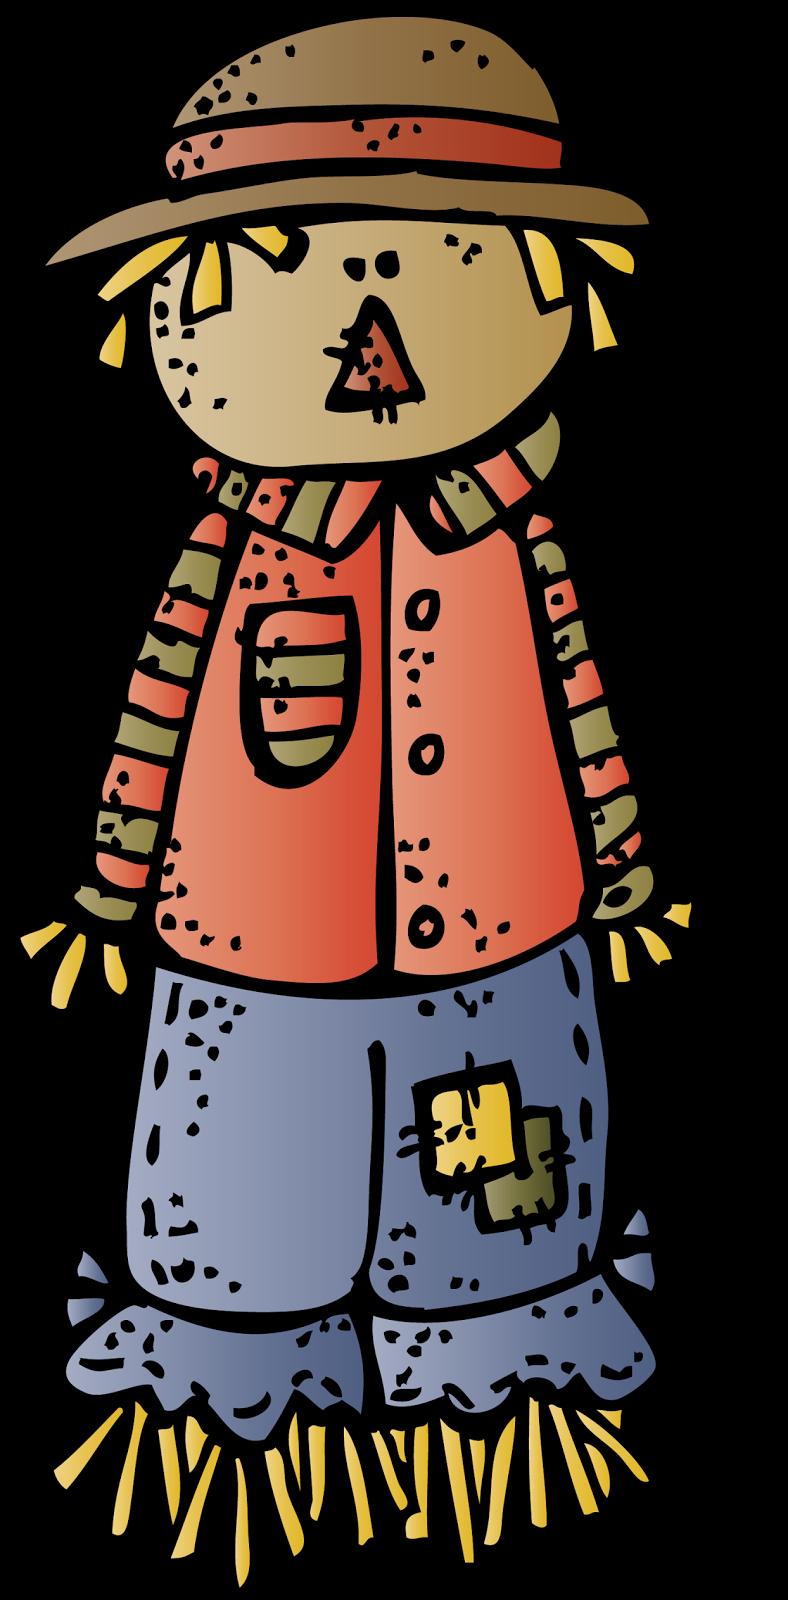 Free Melonheadz Homework Cliparts Download Free Clip Art Free Clip Art on Clipart Library